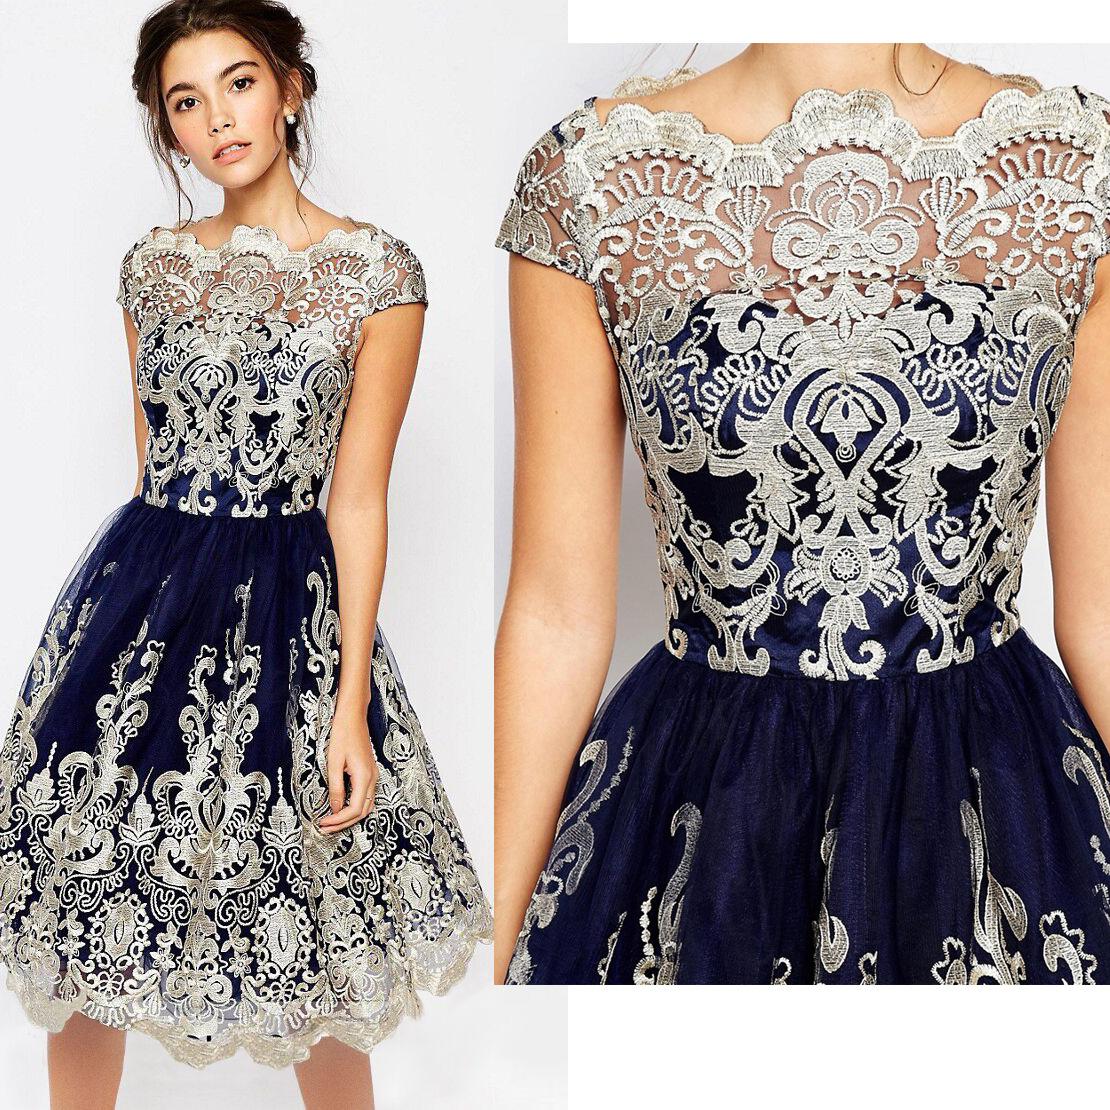 e542edf6651e13 2019 Fashion Ukraine Women Summer Dress Vintage Style Plus Size ...